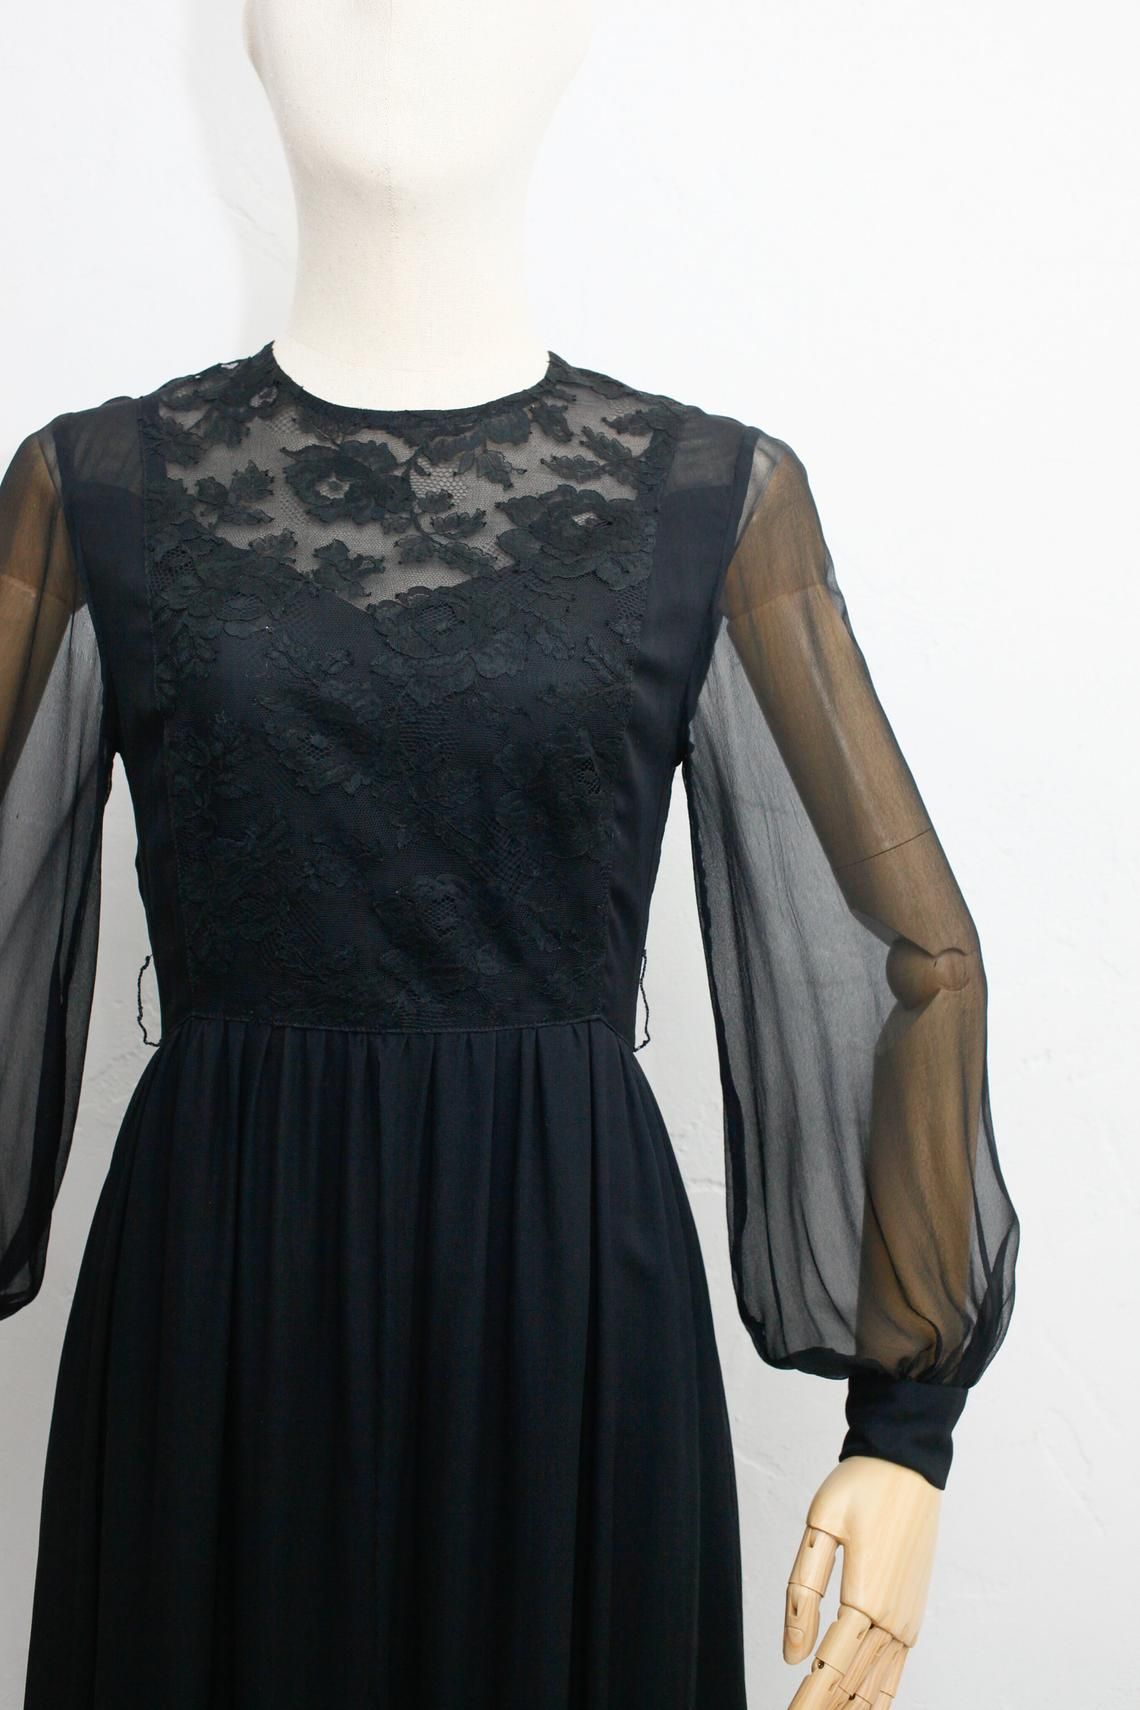 a1e9cd4efbe6e Hanae Mori 70s Vintage Silk Dress | Japanese Vintage Dress | Black ...